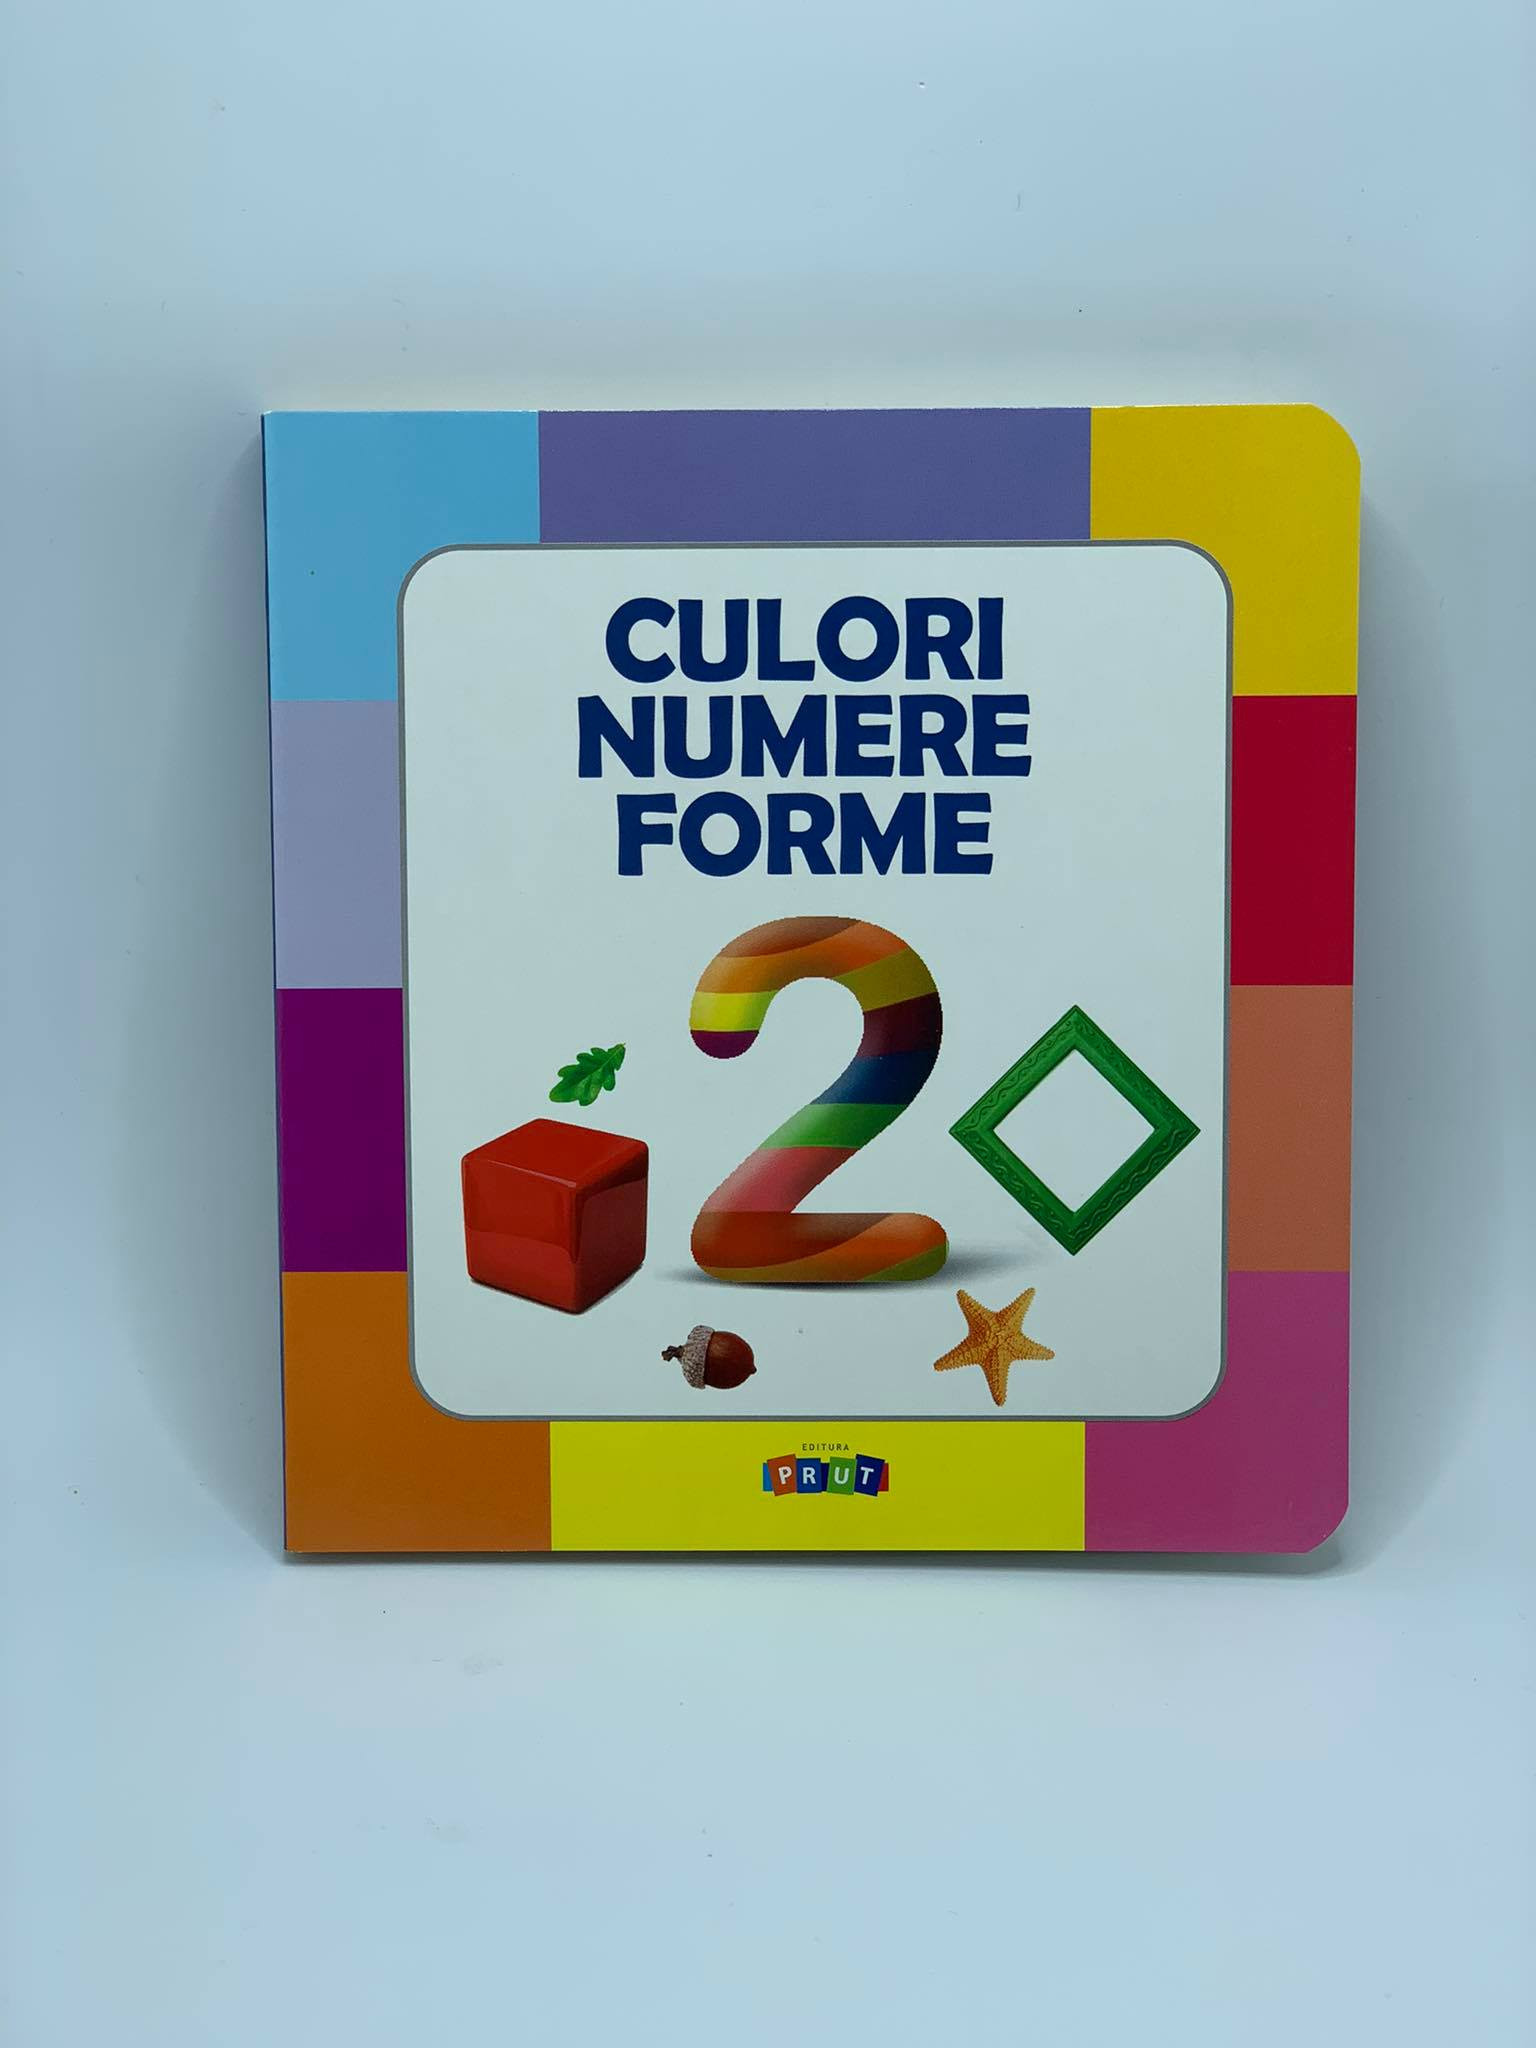 Culori Numere Forme Prima Mea Carte cu Imagini (0-2 ani)